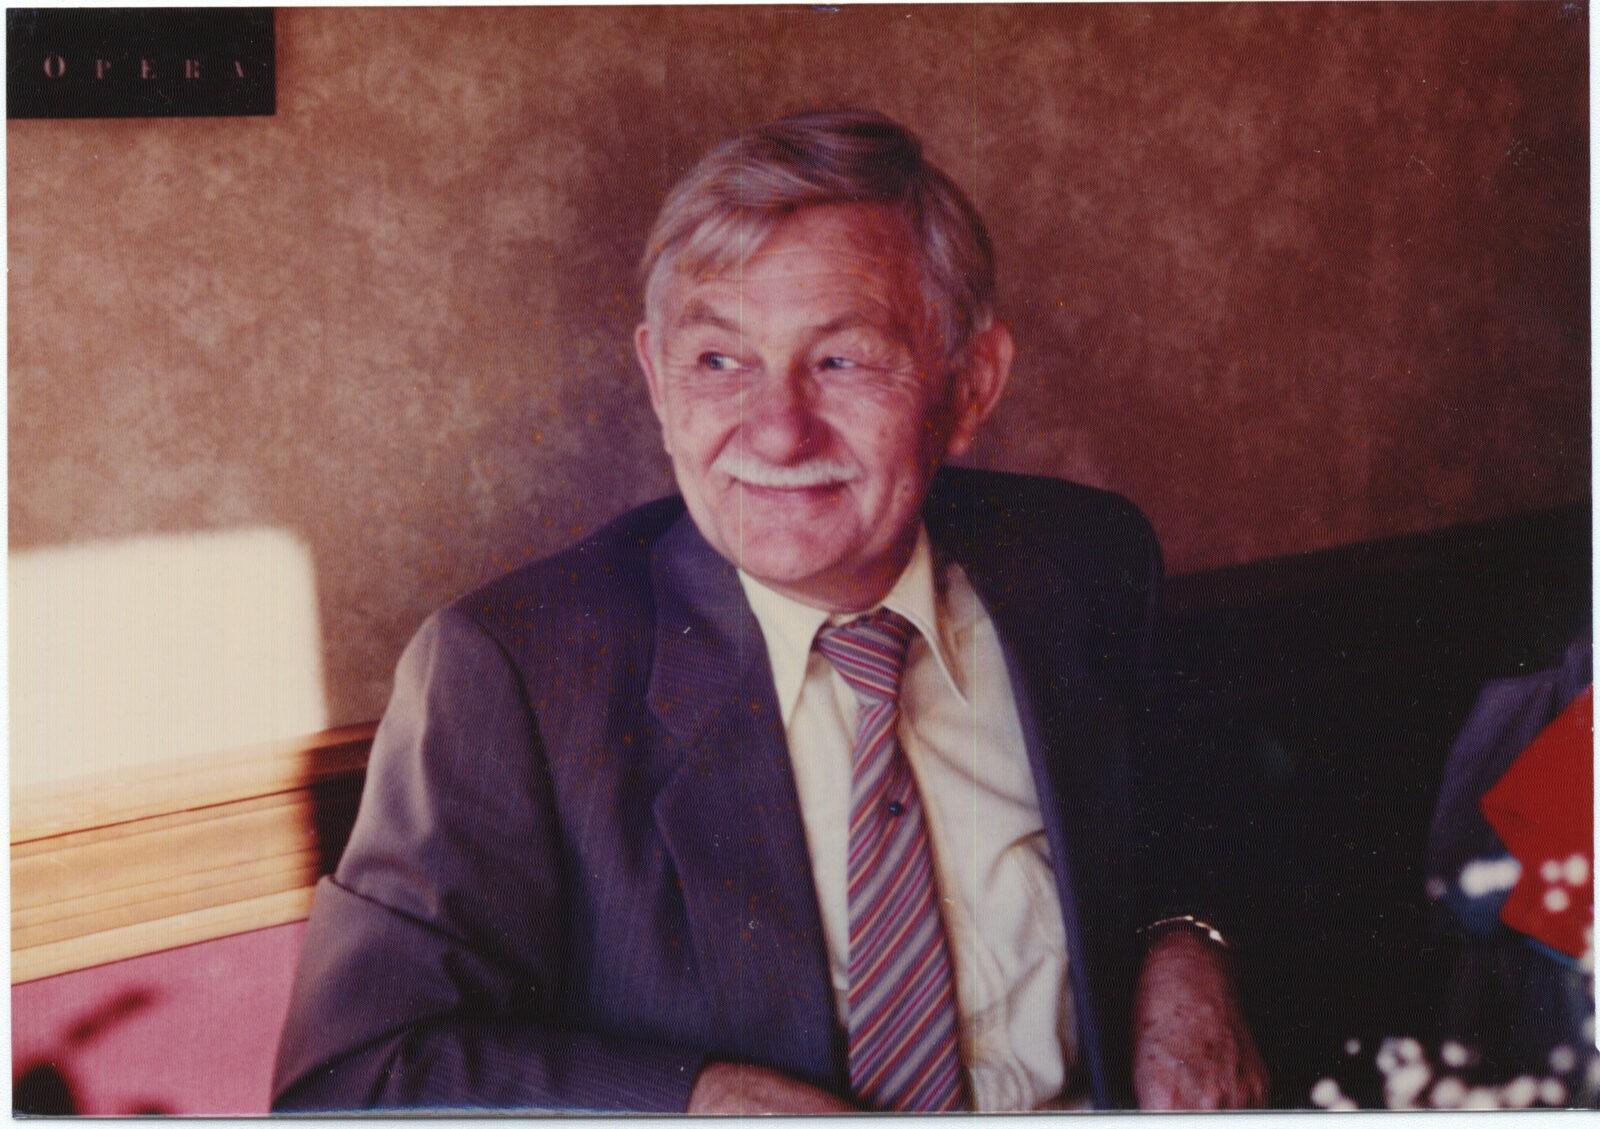 JohnBCalhoun1986